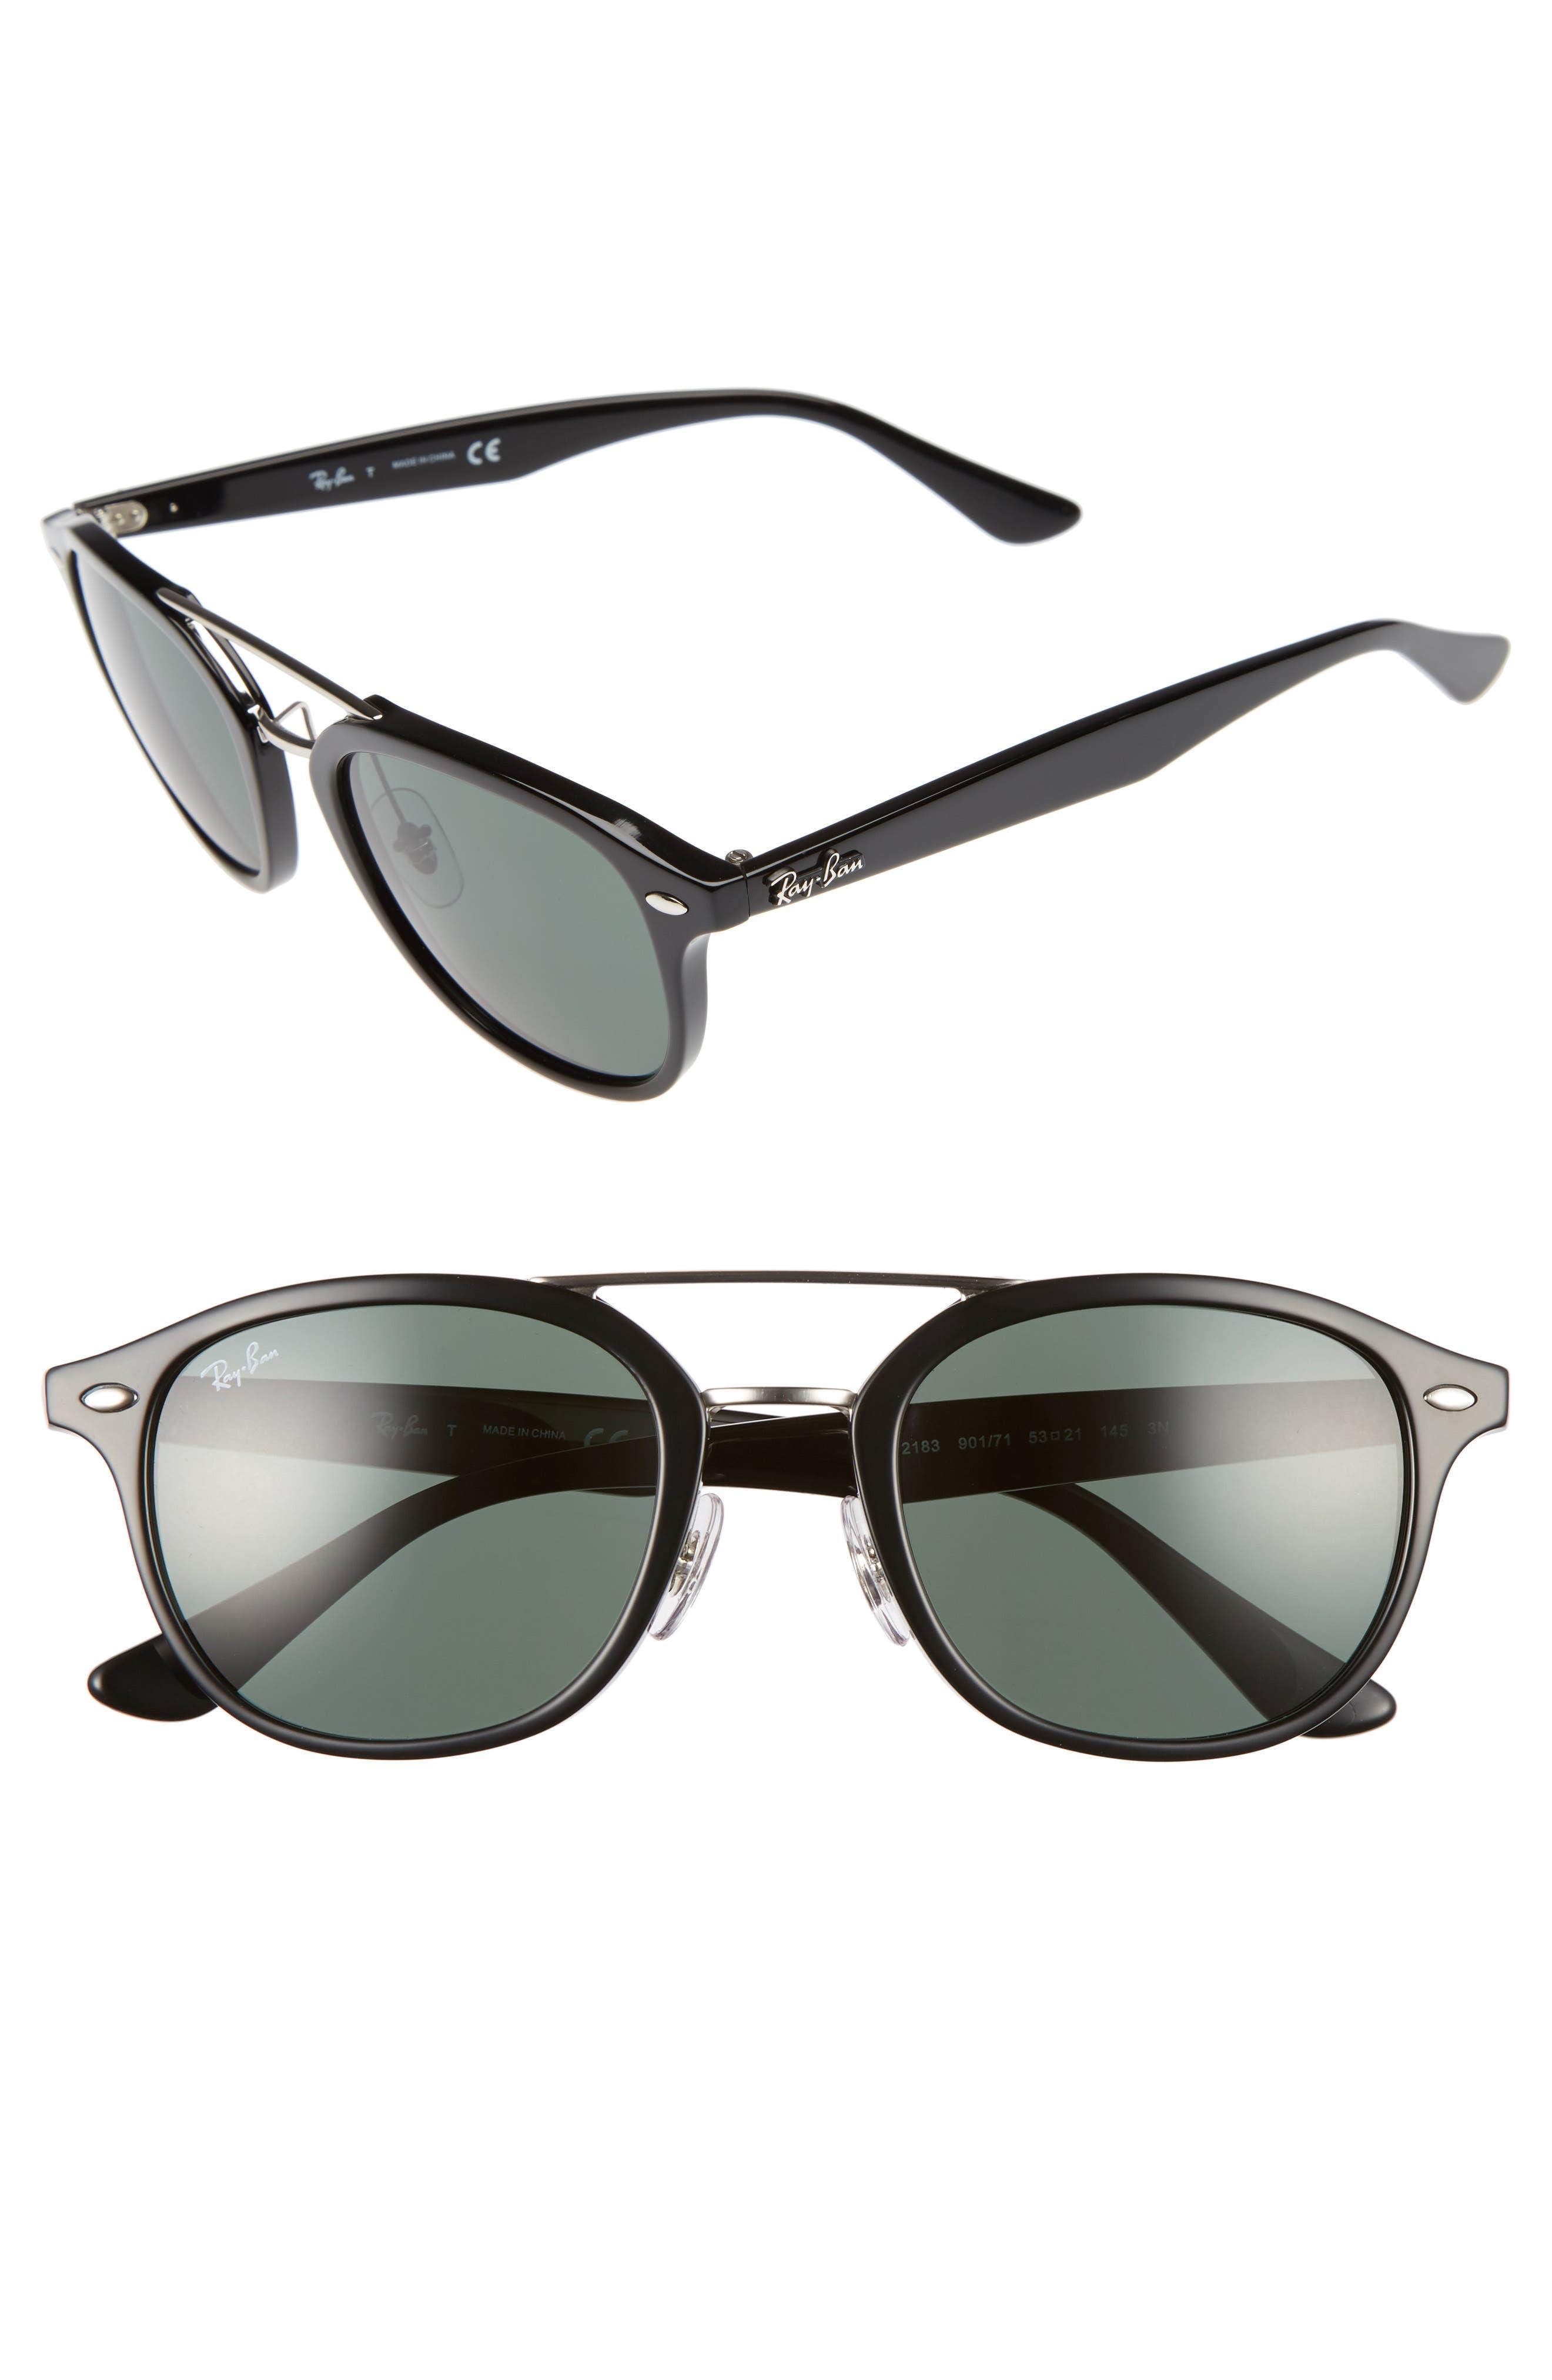 Highstreet 53mm Sunglasses,                             Main thumbnail 1, color,                             BLACK/ GREEN